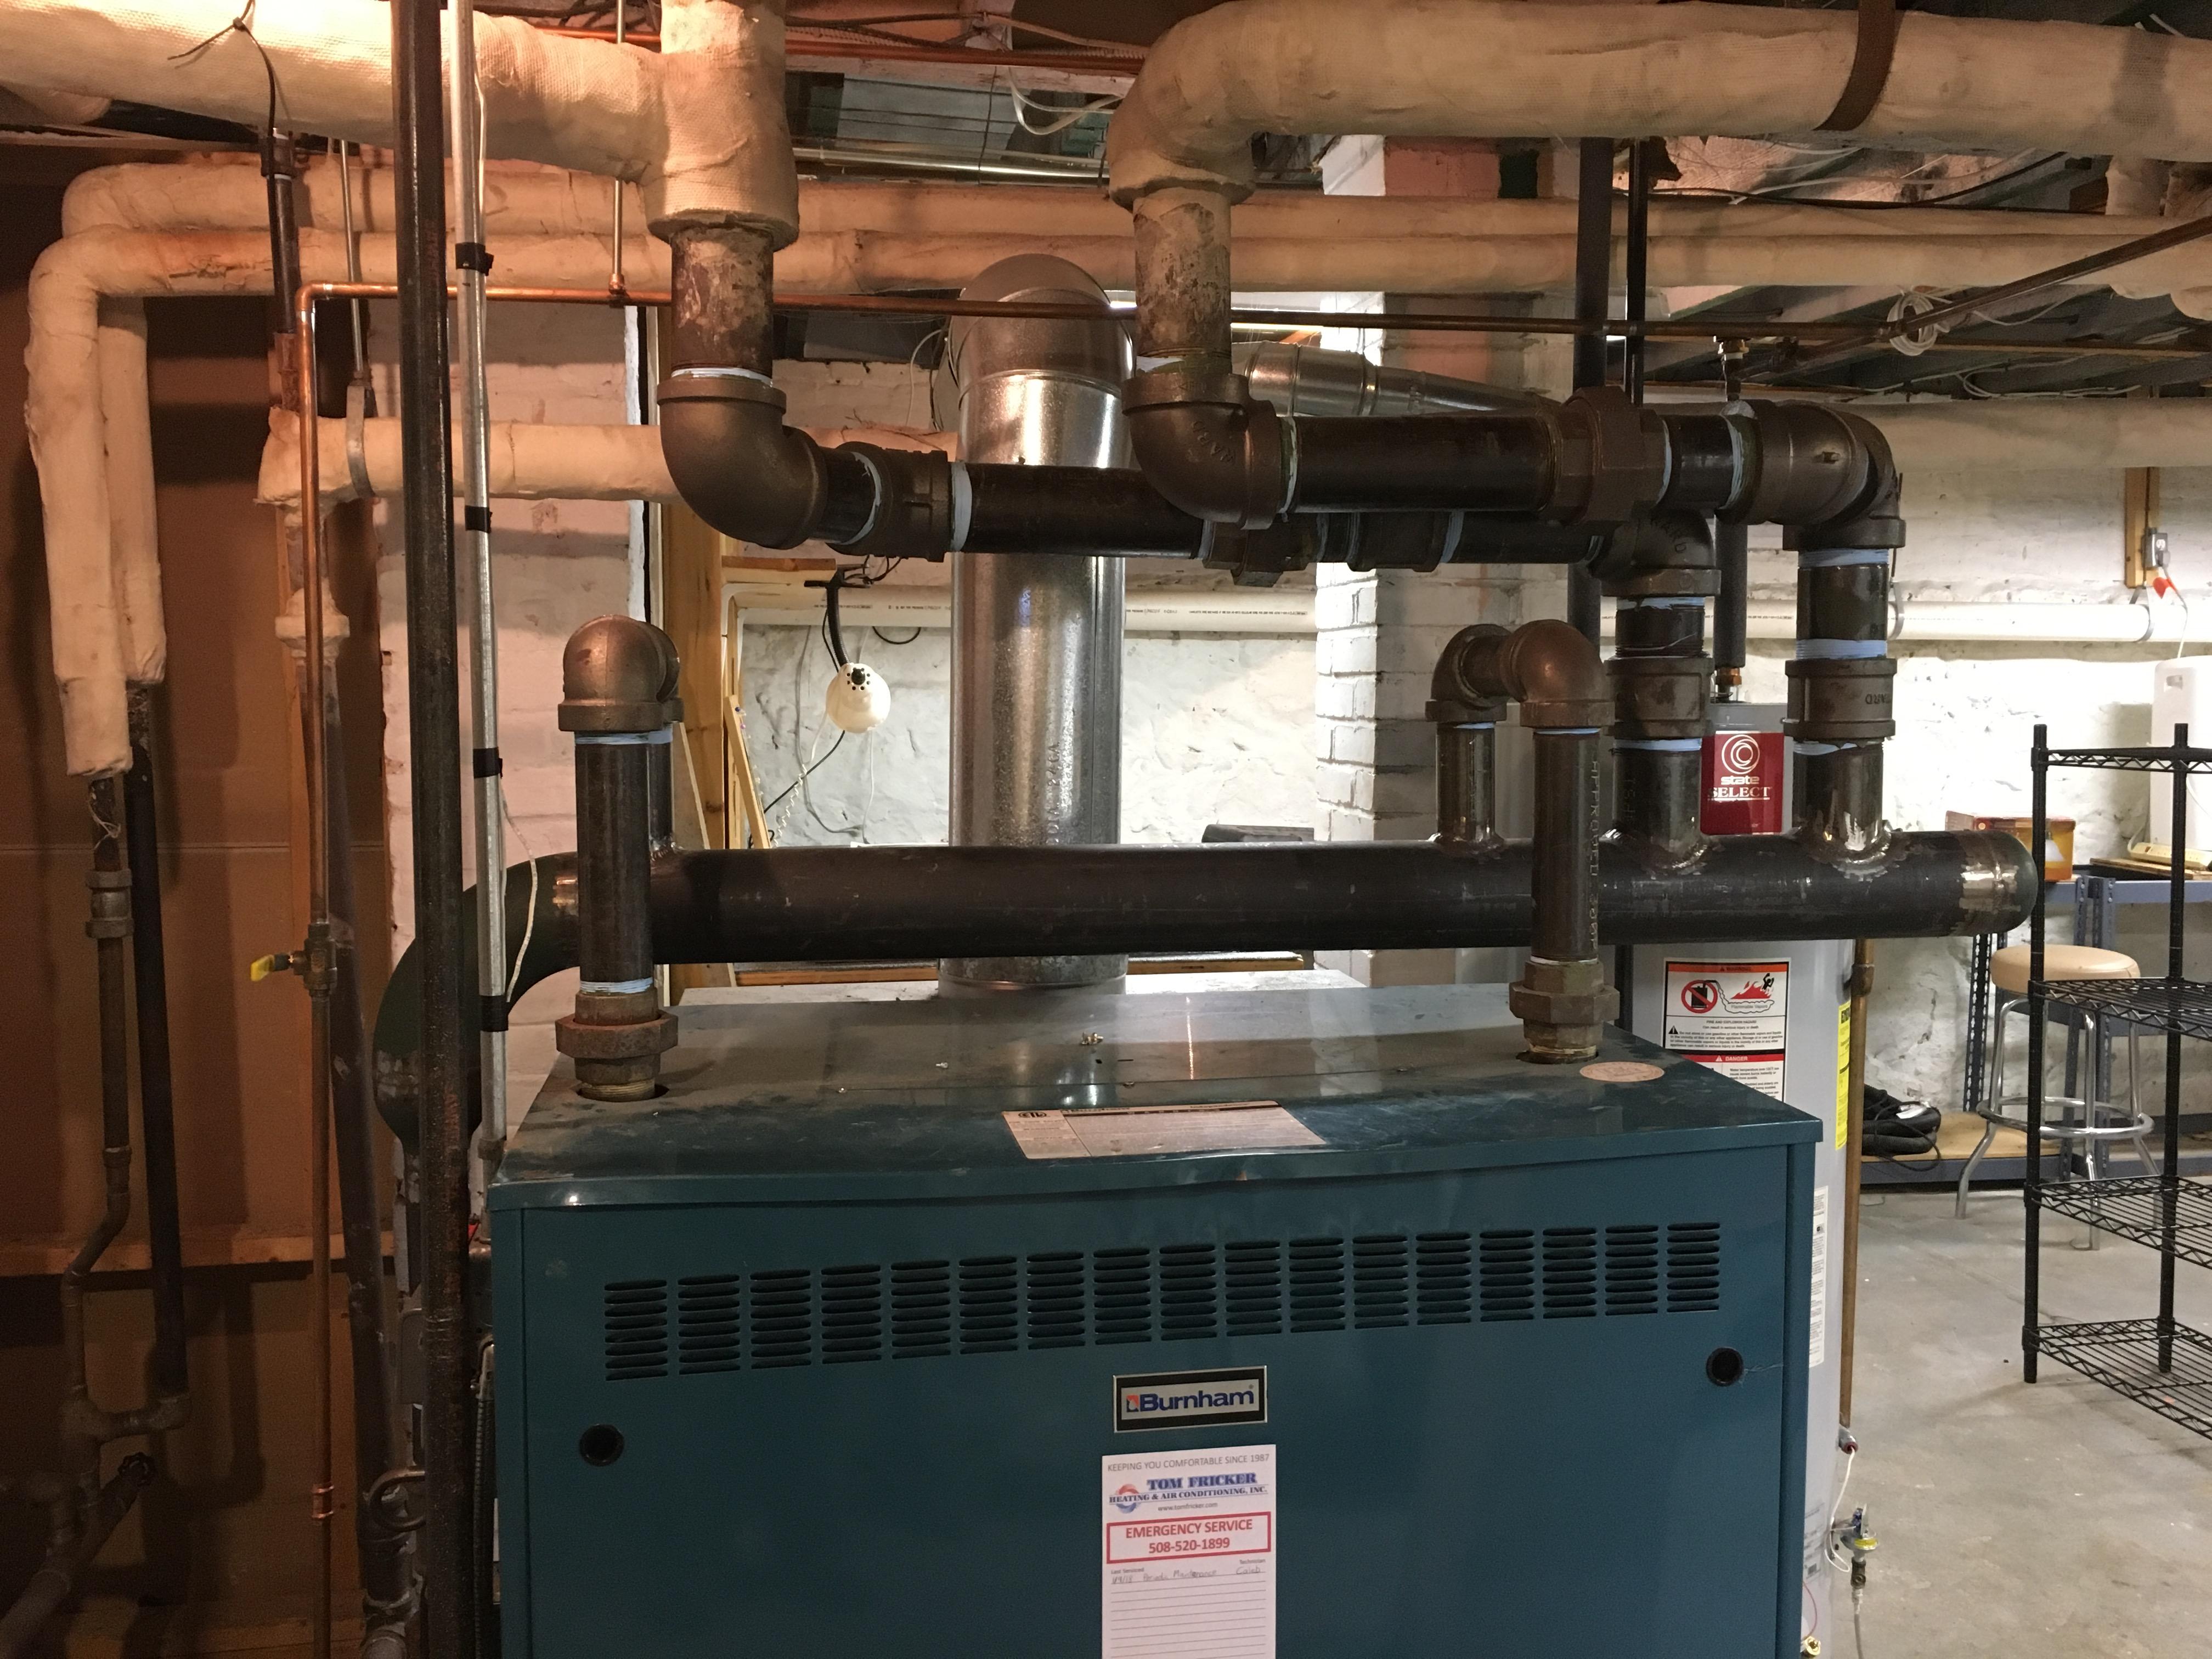 Near Boiler Piping Layout Heating Help The Wall Books 7afdddce C2fa 447f 8b33 660e1ad21652jpeg